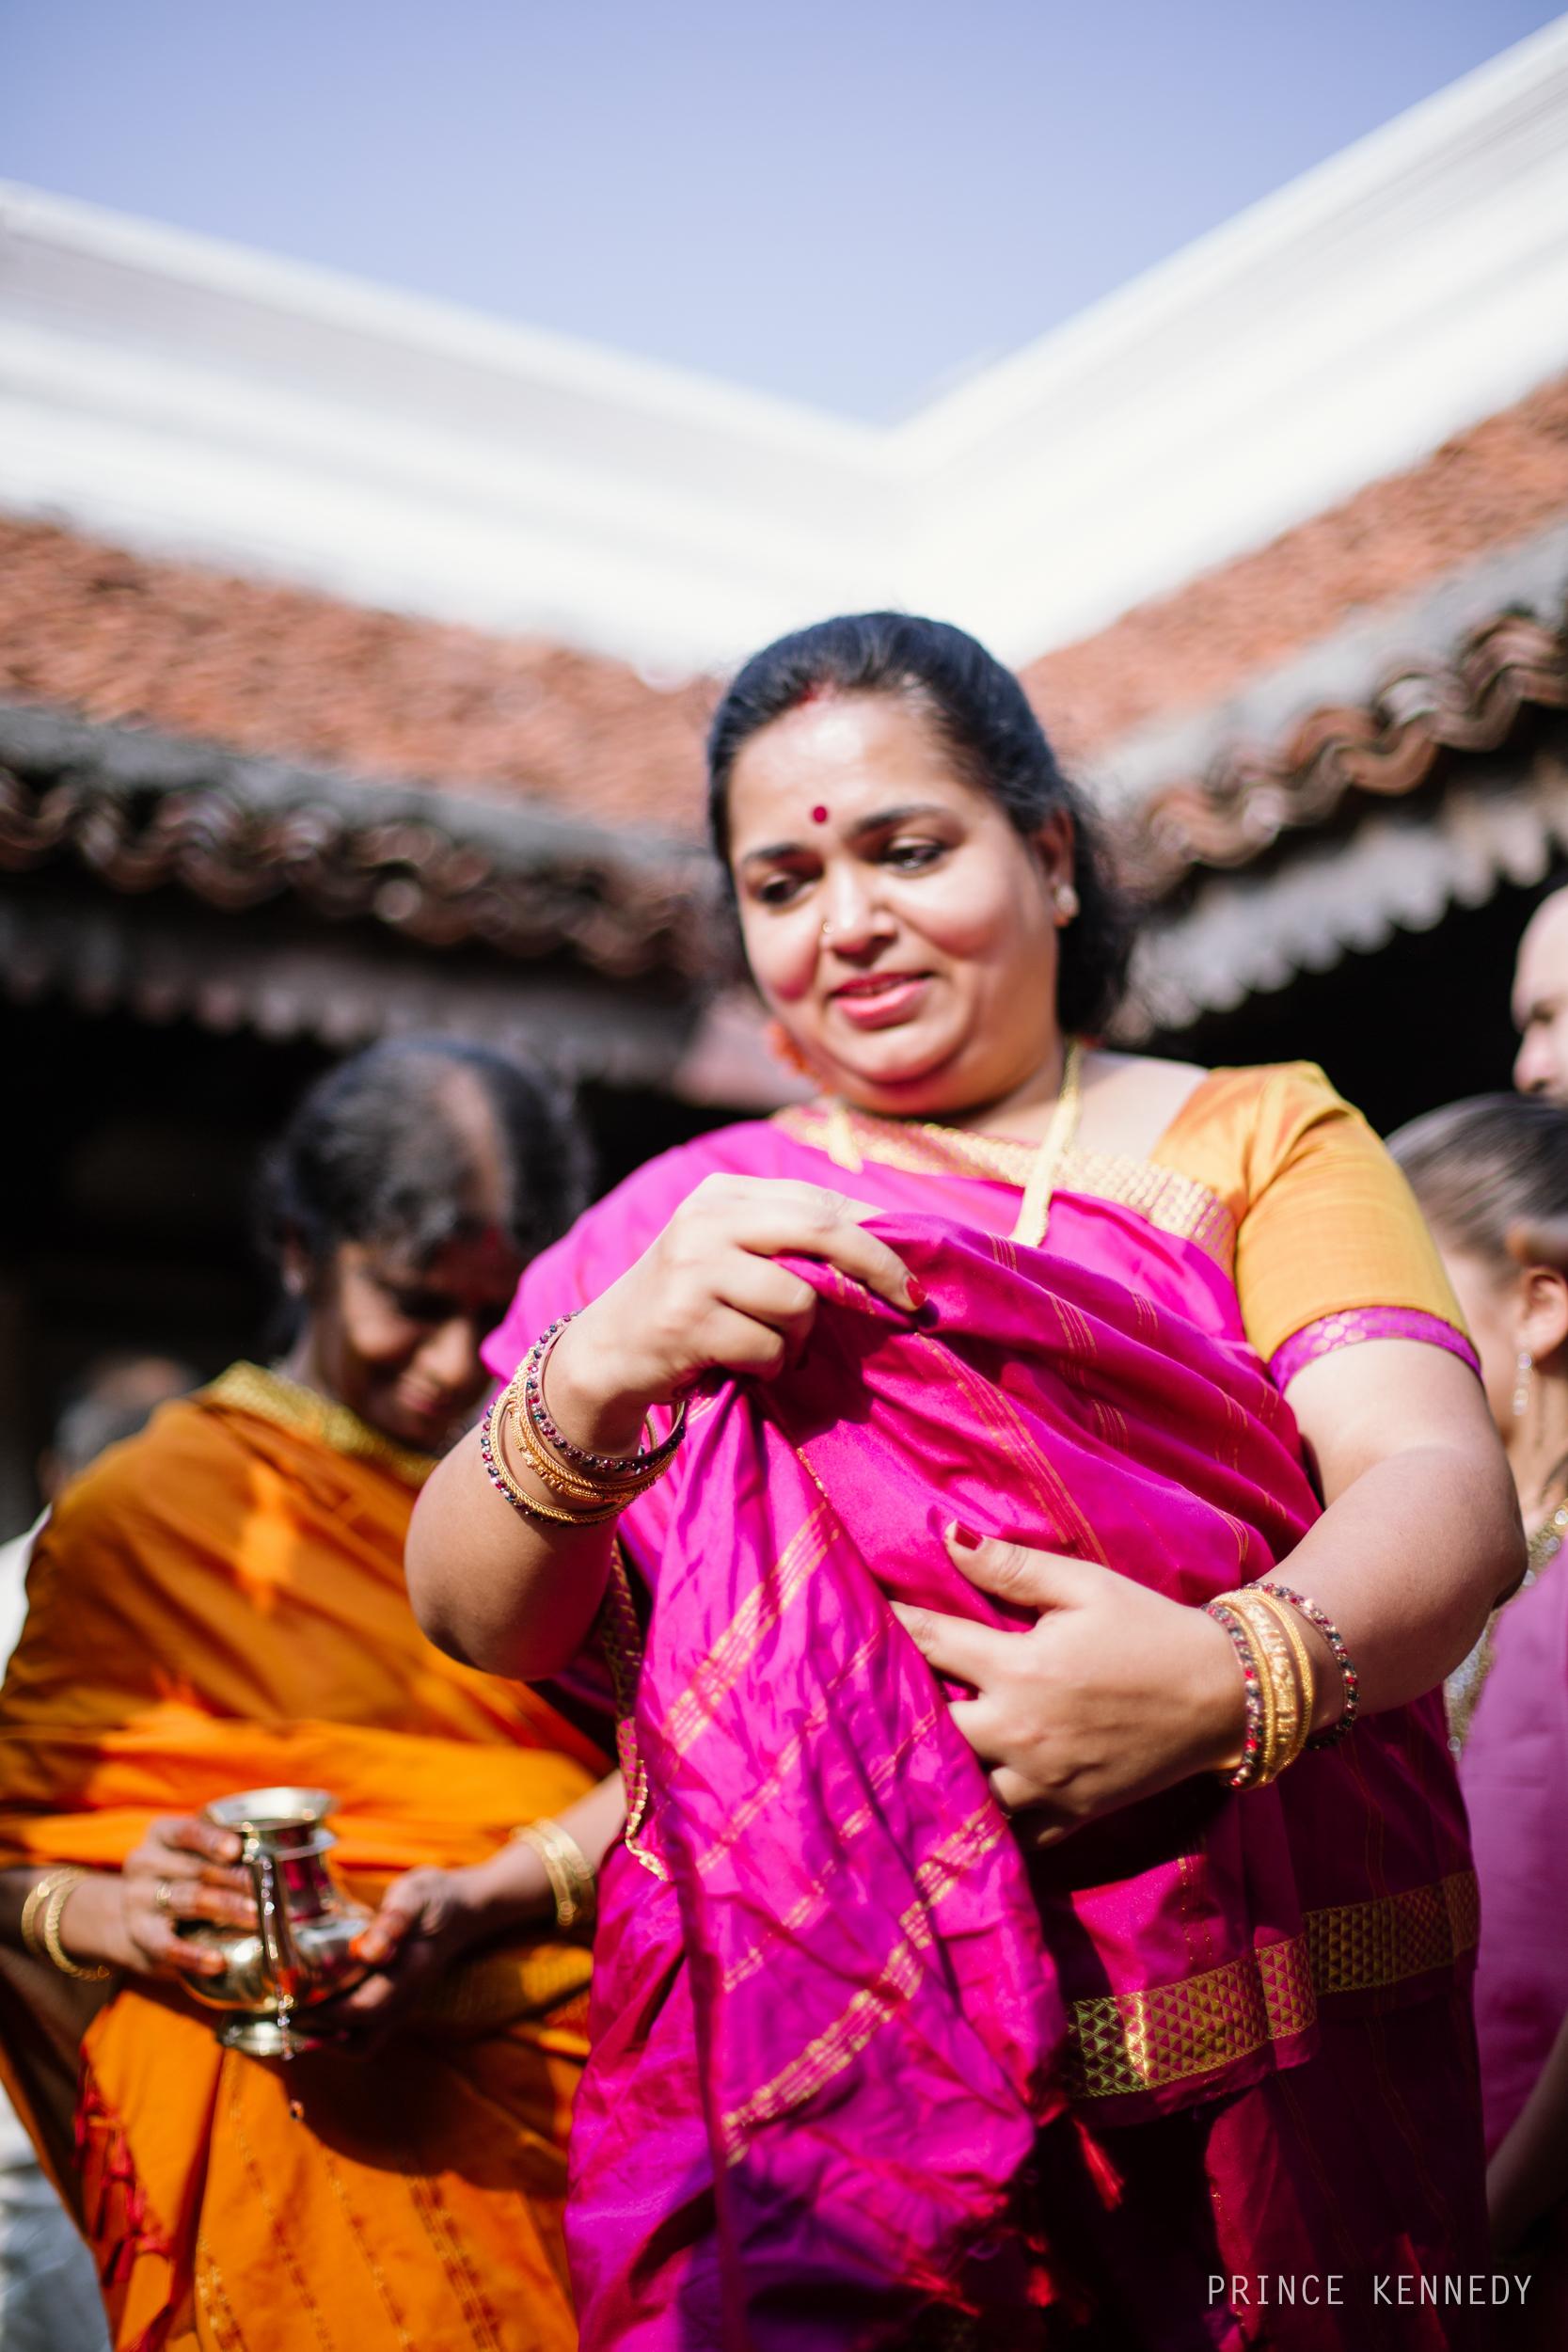 Athmajja-Nithesh-Engagement-Couple-Portrait-Portraiture-Wedding-Couple-Portrait-Chennai-Photographer-Candid-Photography-Destination-Best-Prince-Kennedy-Photography-184.jpg